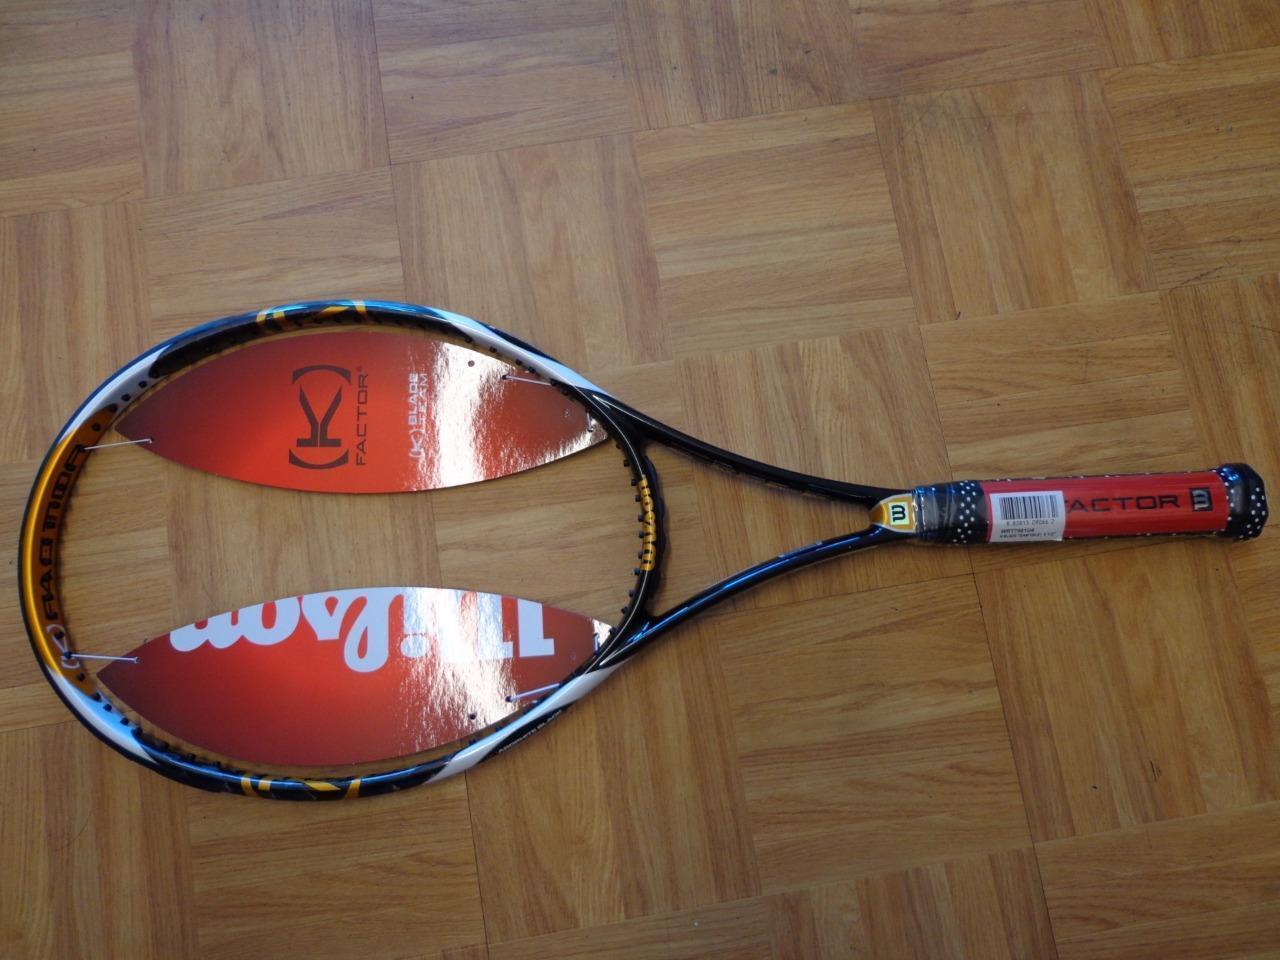 Nuevo Raro Wilson K Factor Blade 104 Funda 4 1 2 Grip Tenis Raqueta